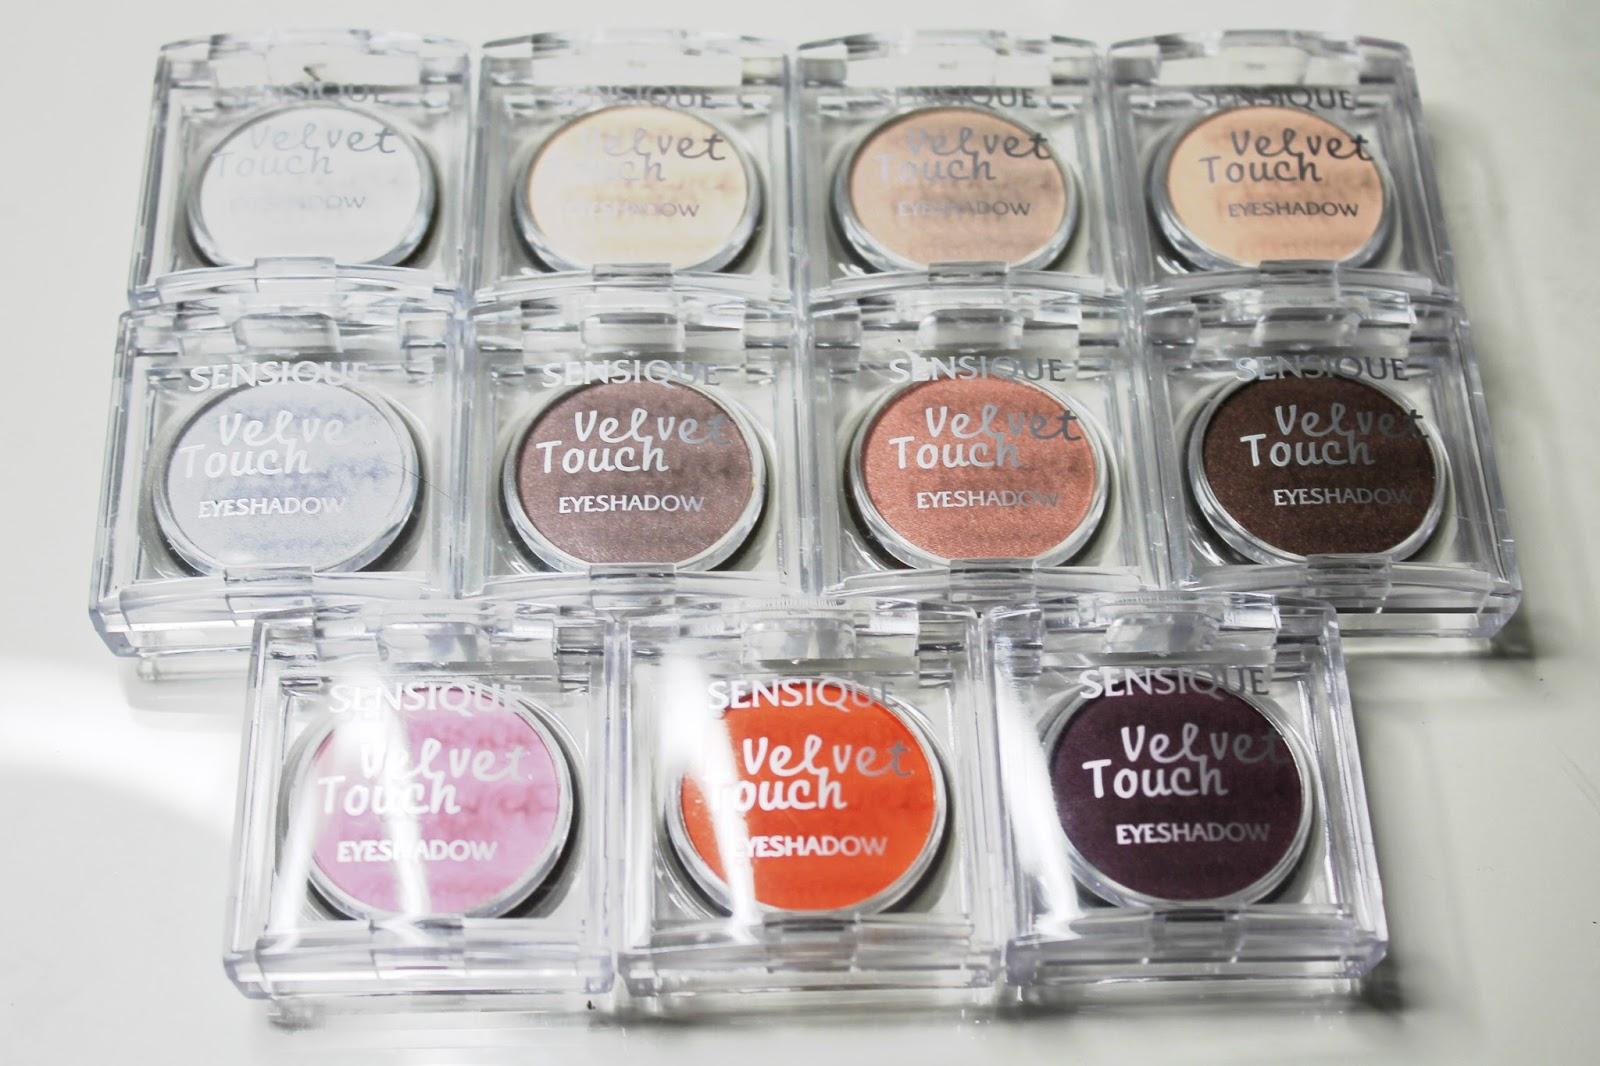 Lutowe nowości Drogerii Natura -  Sensique Velvet Touch Eyeshadows SWATCHE